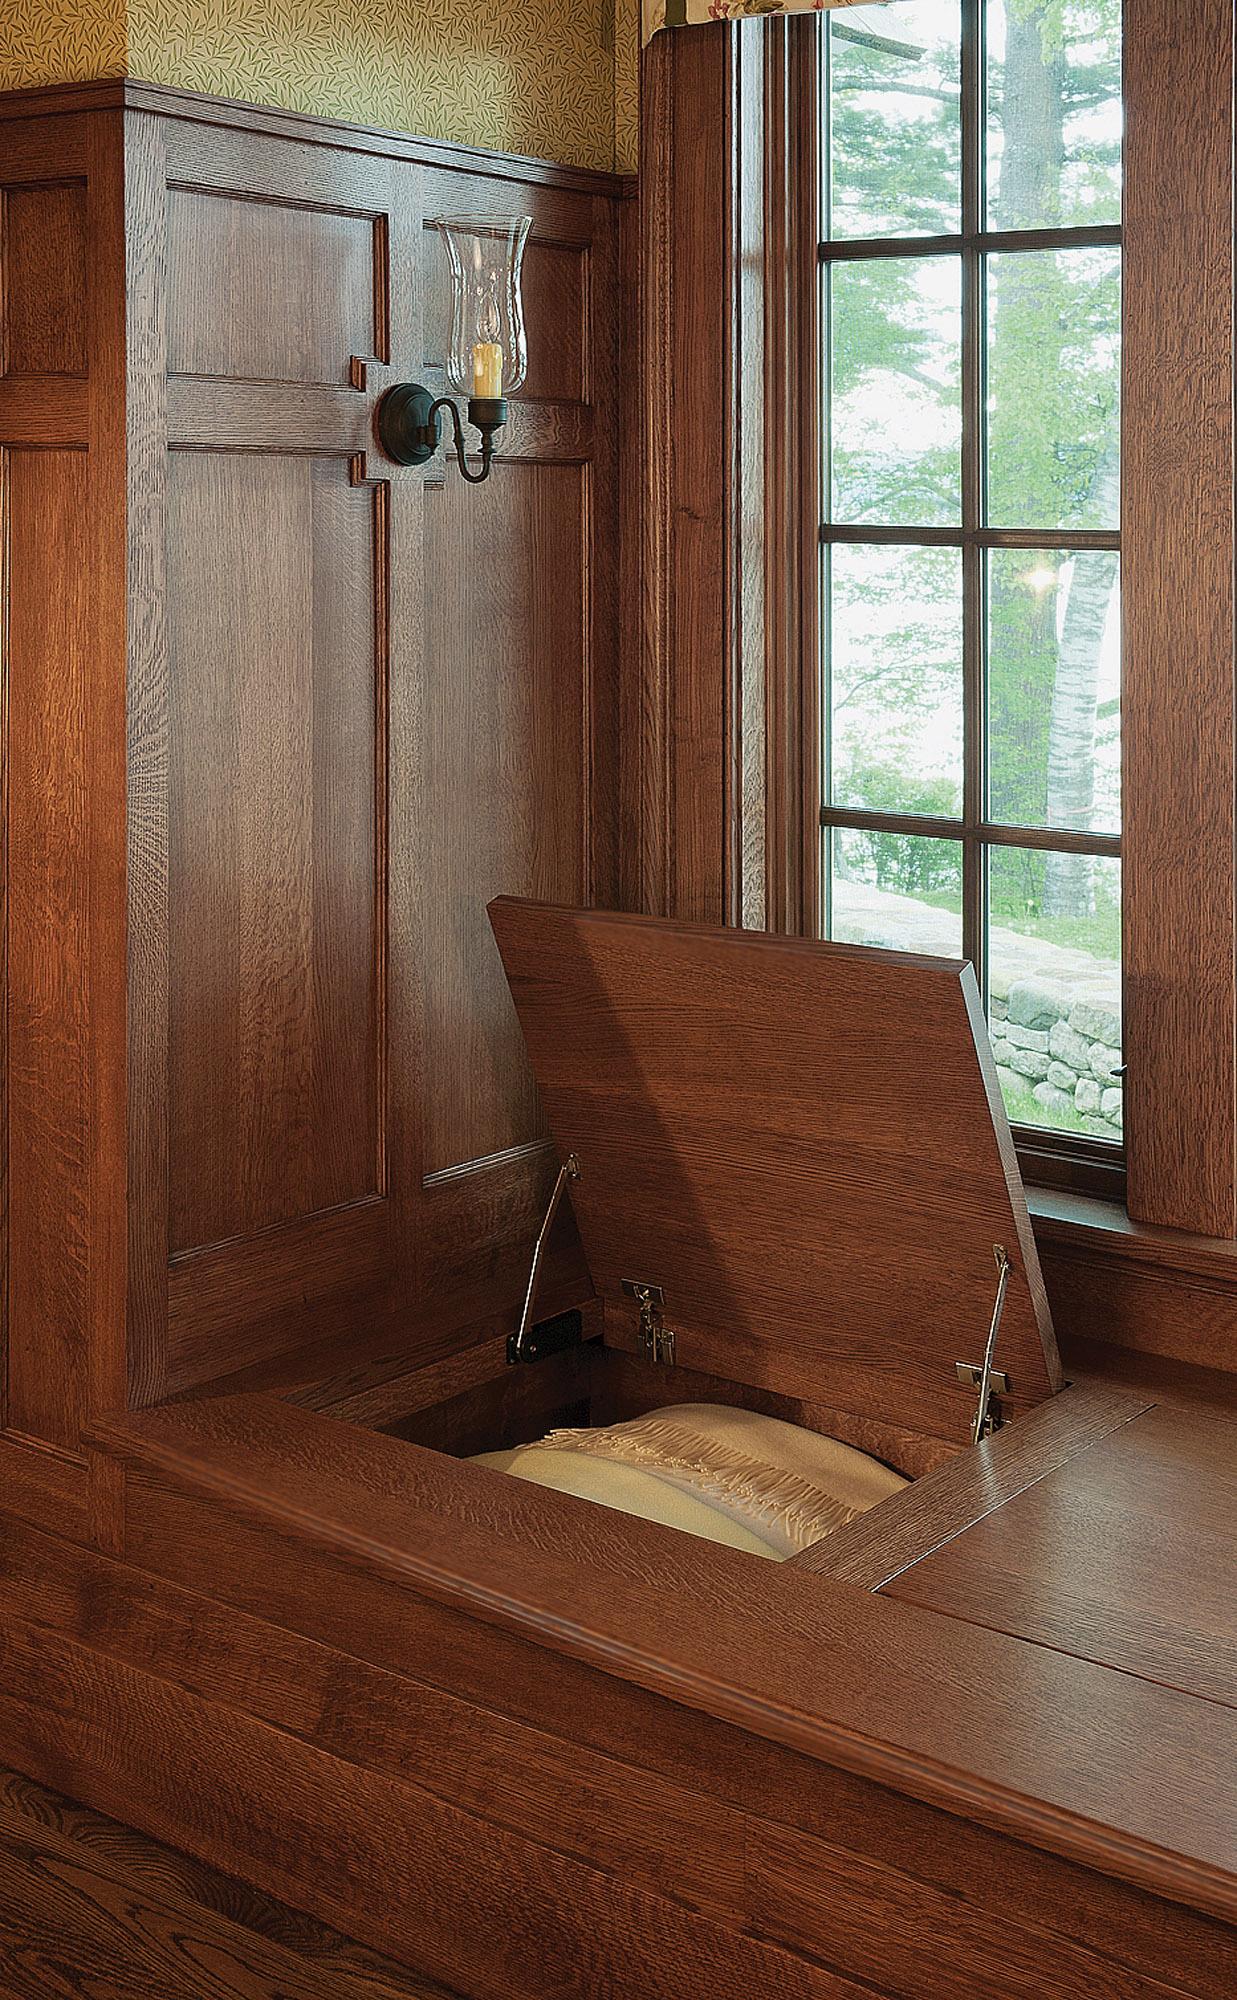 Crown Point window seat